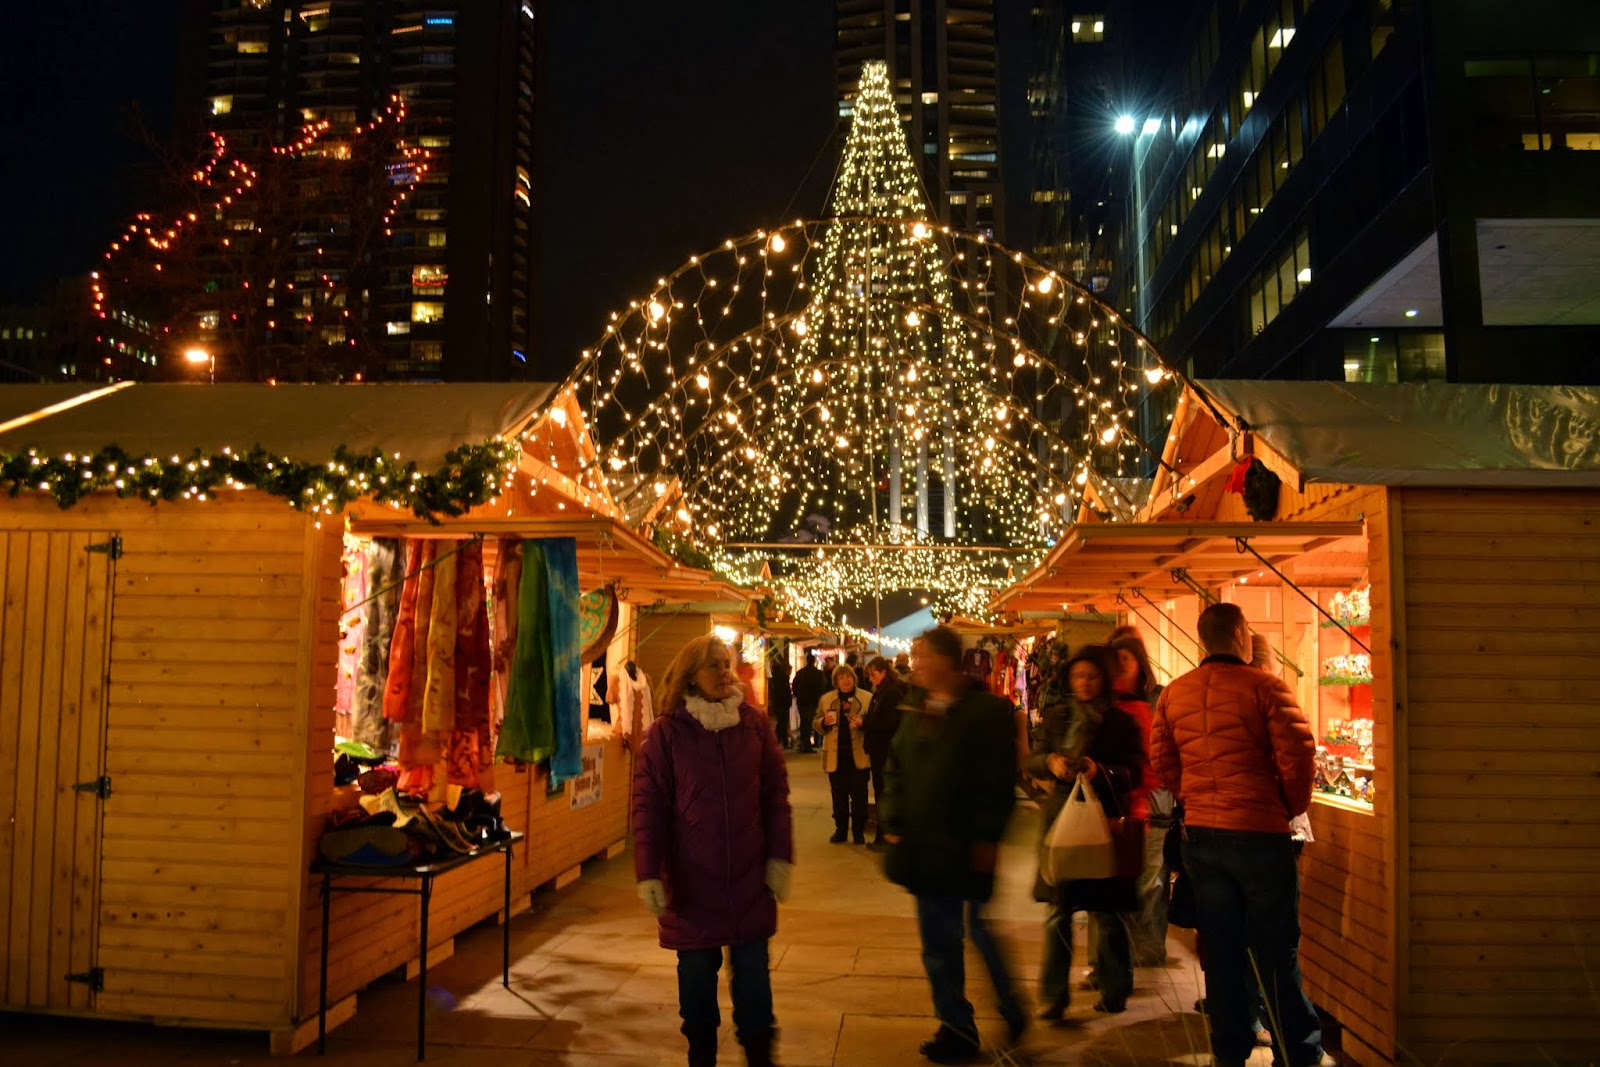 Mille Fiori Favoriti Denver39s Christkindl Market